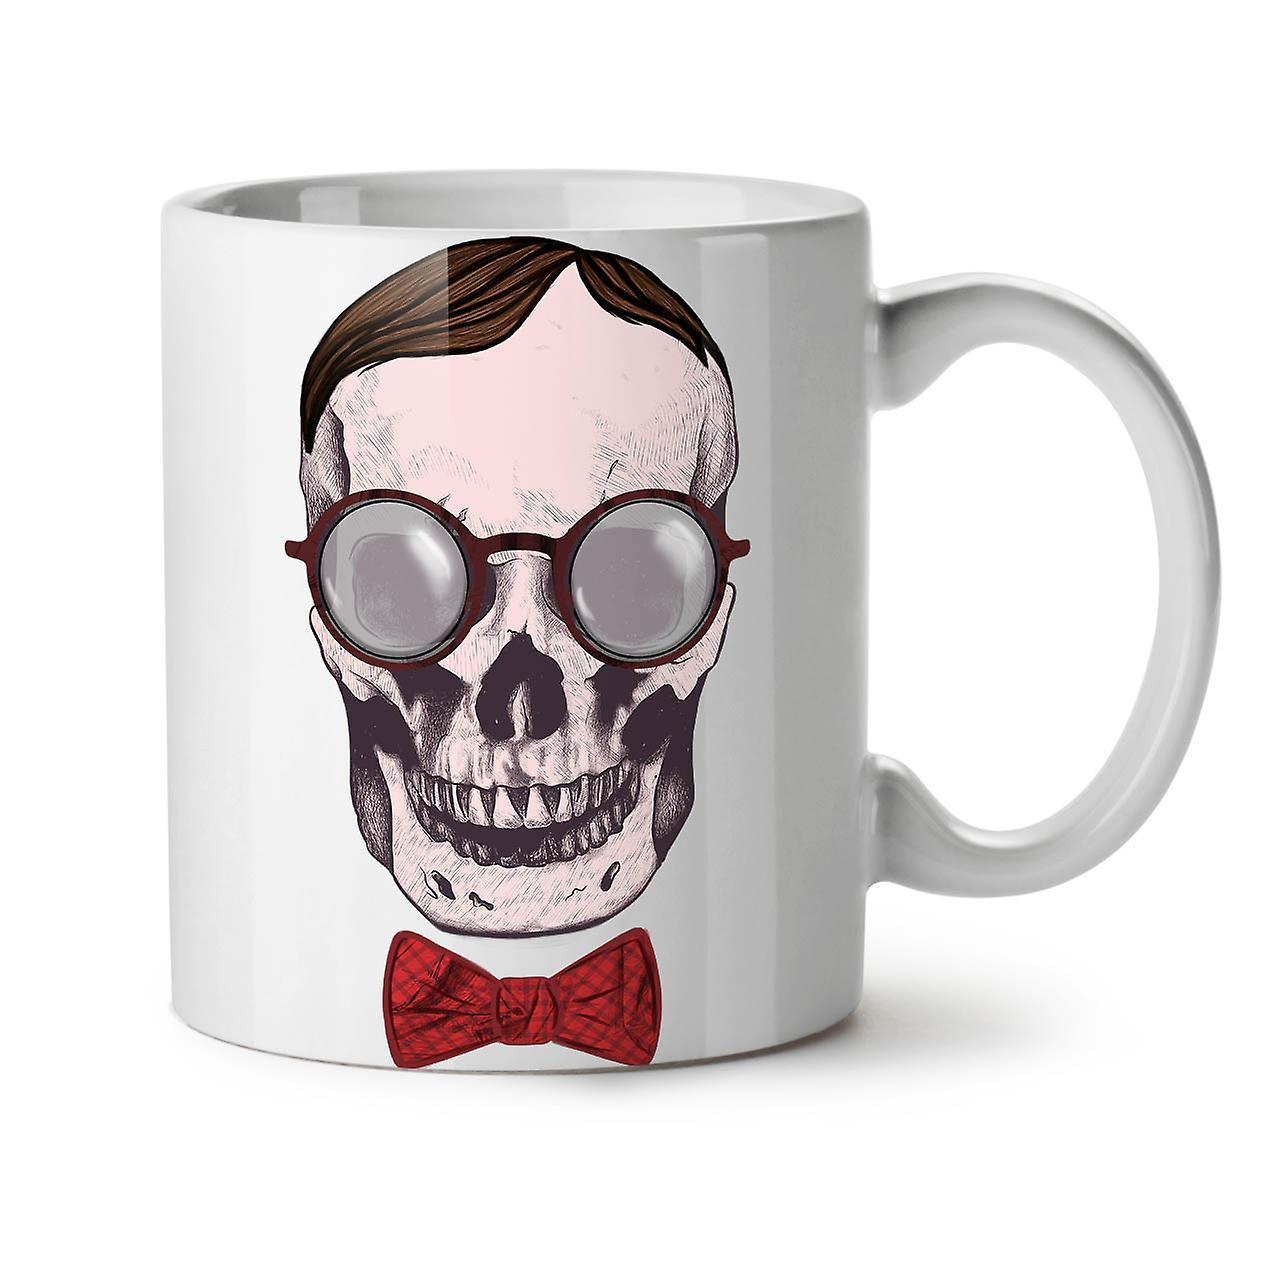 11 Hippie OzWellcoda White New Mug Glasses Tea Coffee Ceramic Skull 4R3cLAqS5j